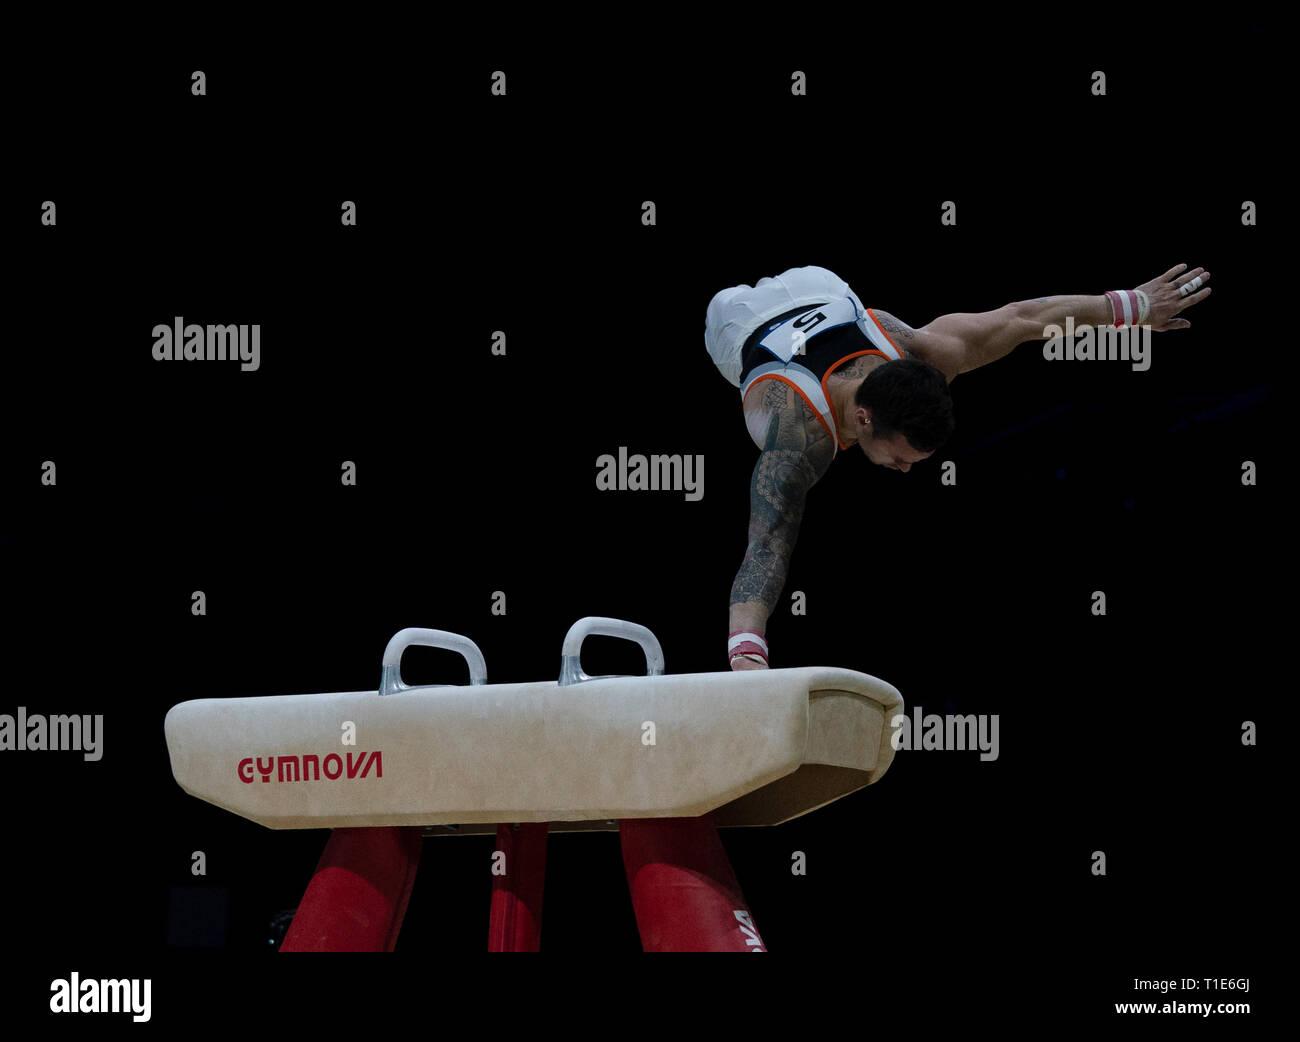 Bart Deurloo (Netherlands) in action during Gymnastics World Cup 2019 at Genting Arena Birmingham United Kingdom on March 23 2019. GlennSports. - Stock Image